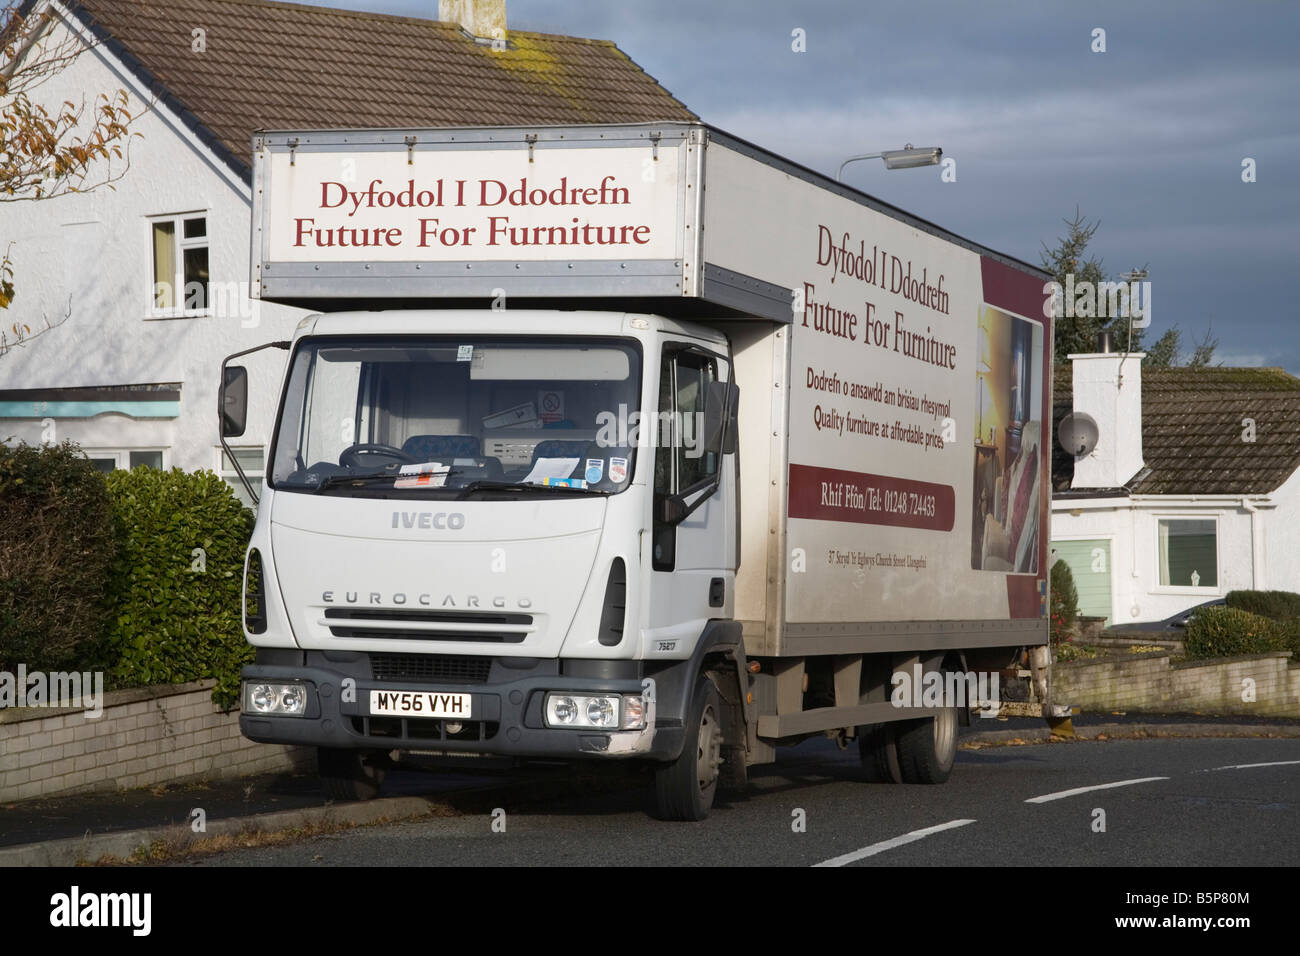 North Wales UK Van sammeln unerwünschte Möbel Umverteilung verhindert senden an land füllen lokalen Stockbild